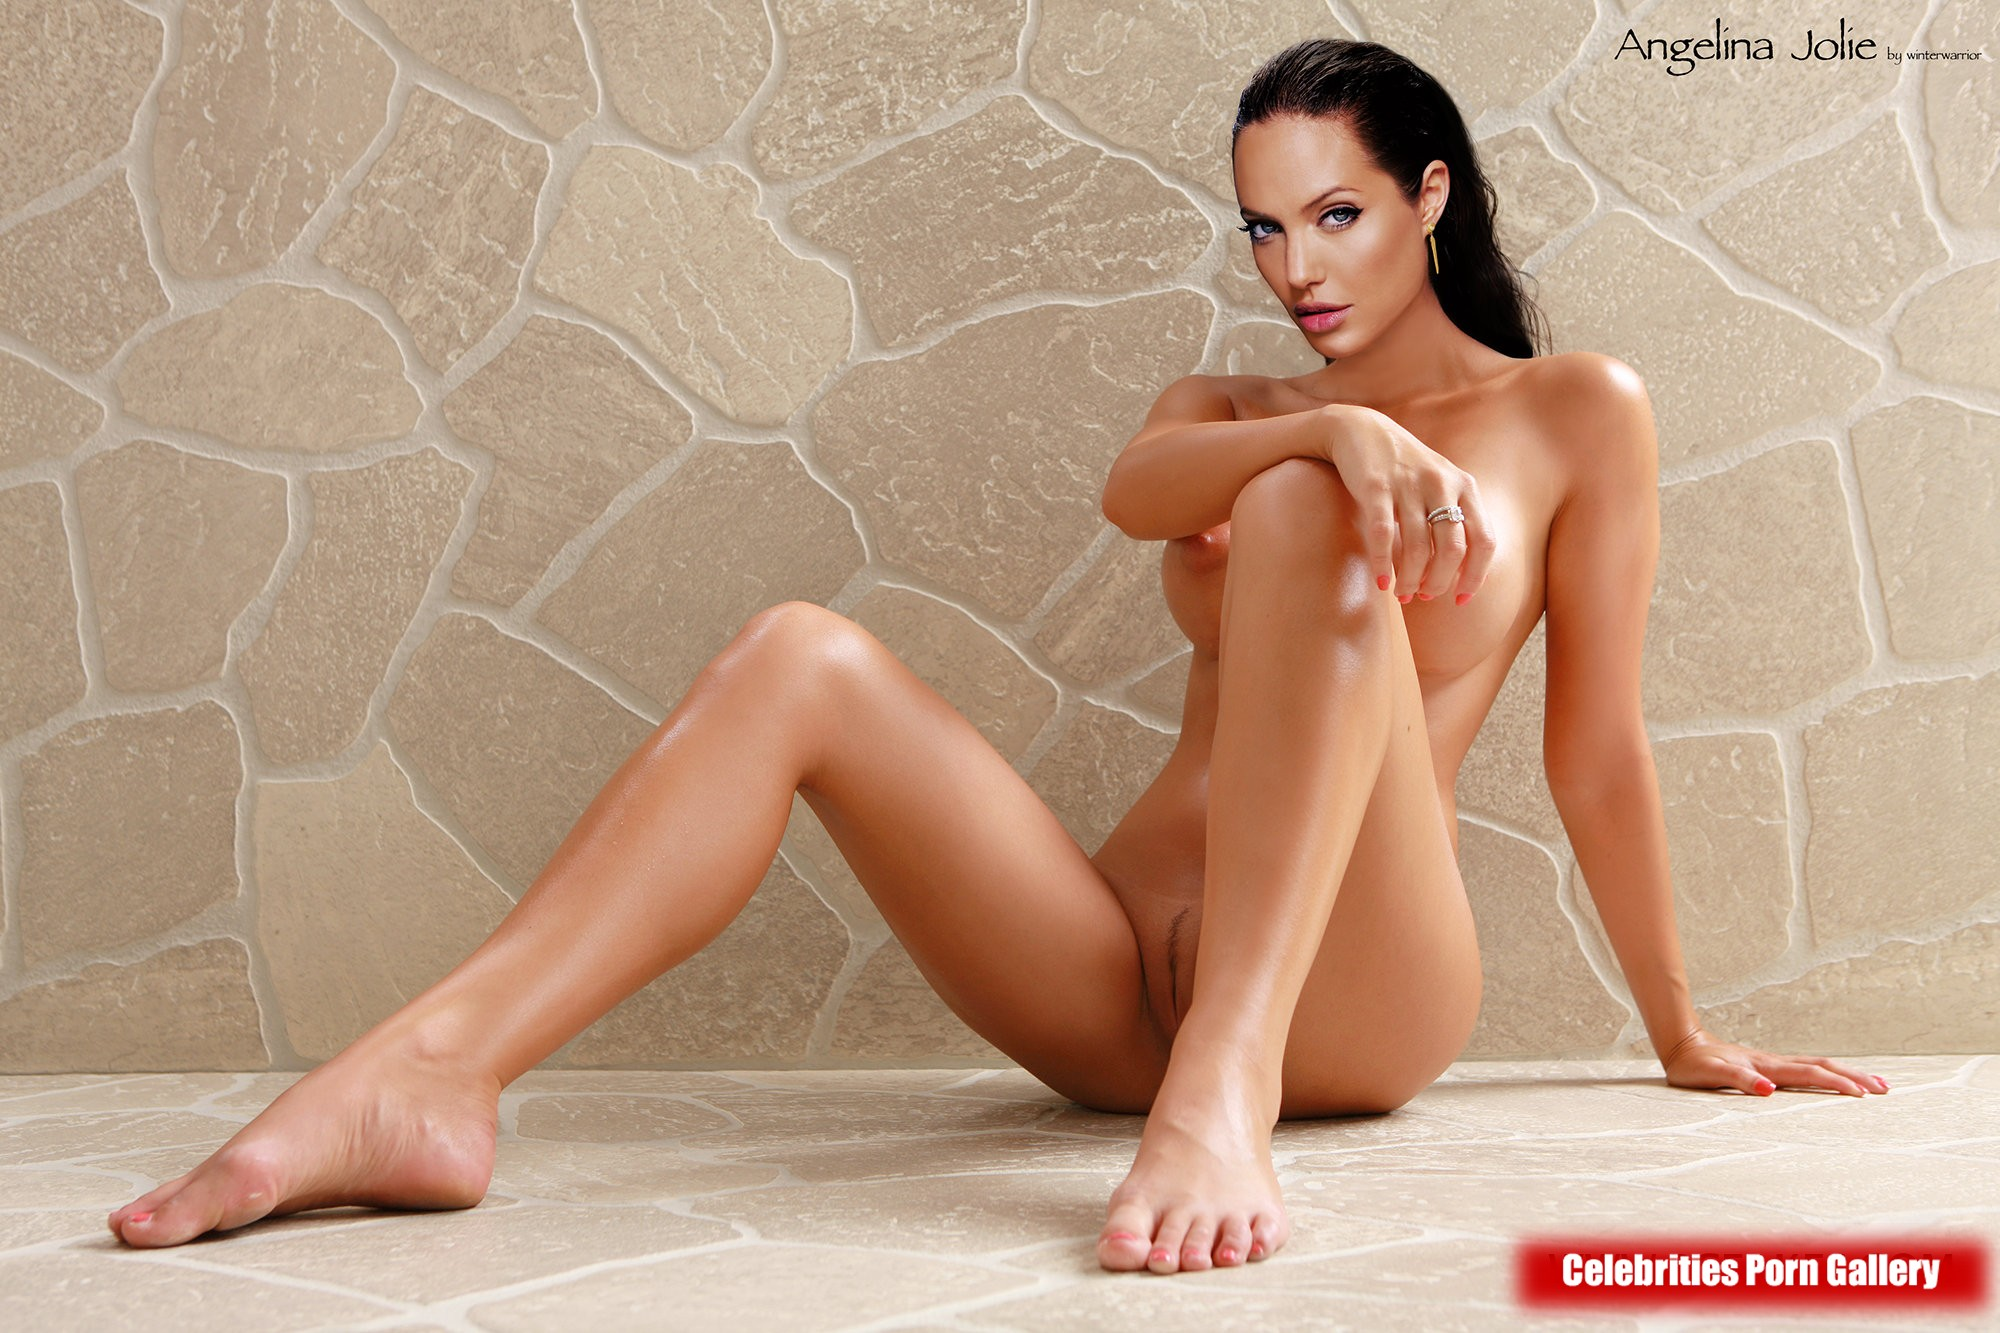 Angelina Jolie Sex Porn angelina jolie free porn pics - kaylamreed